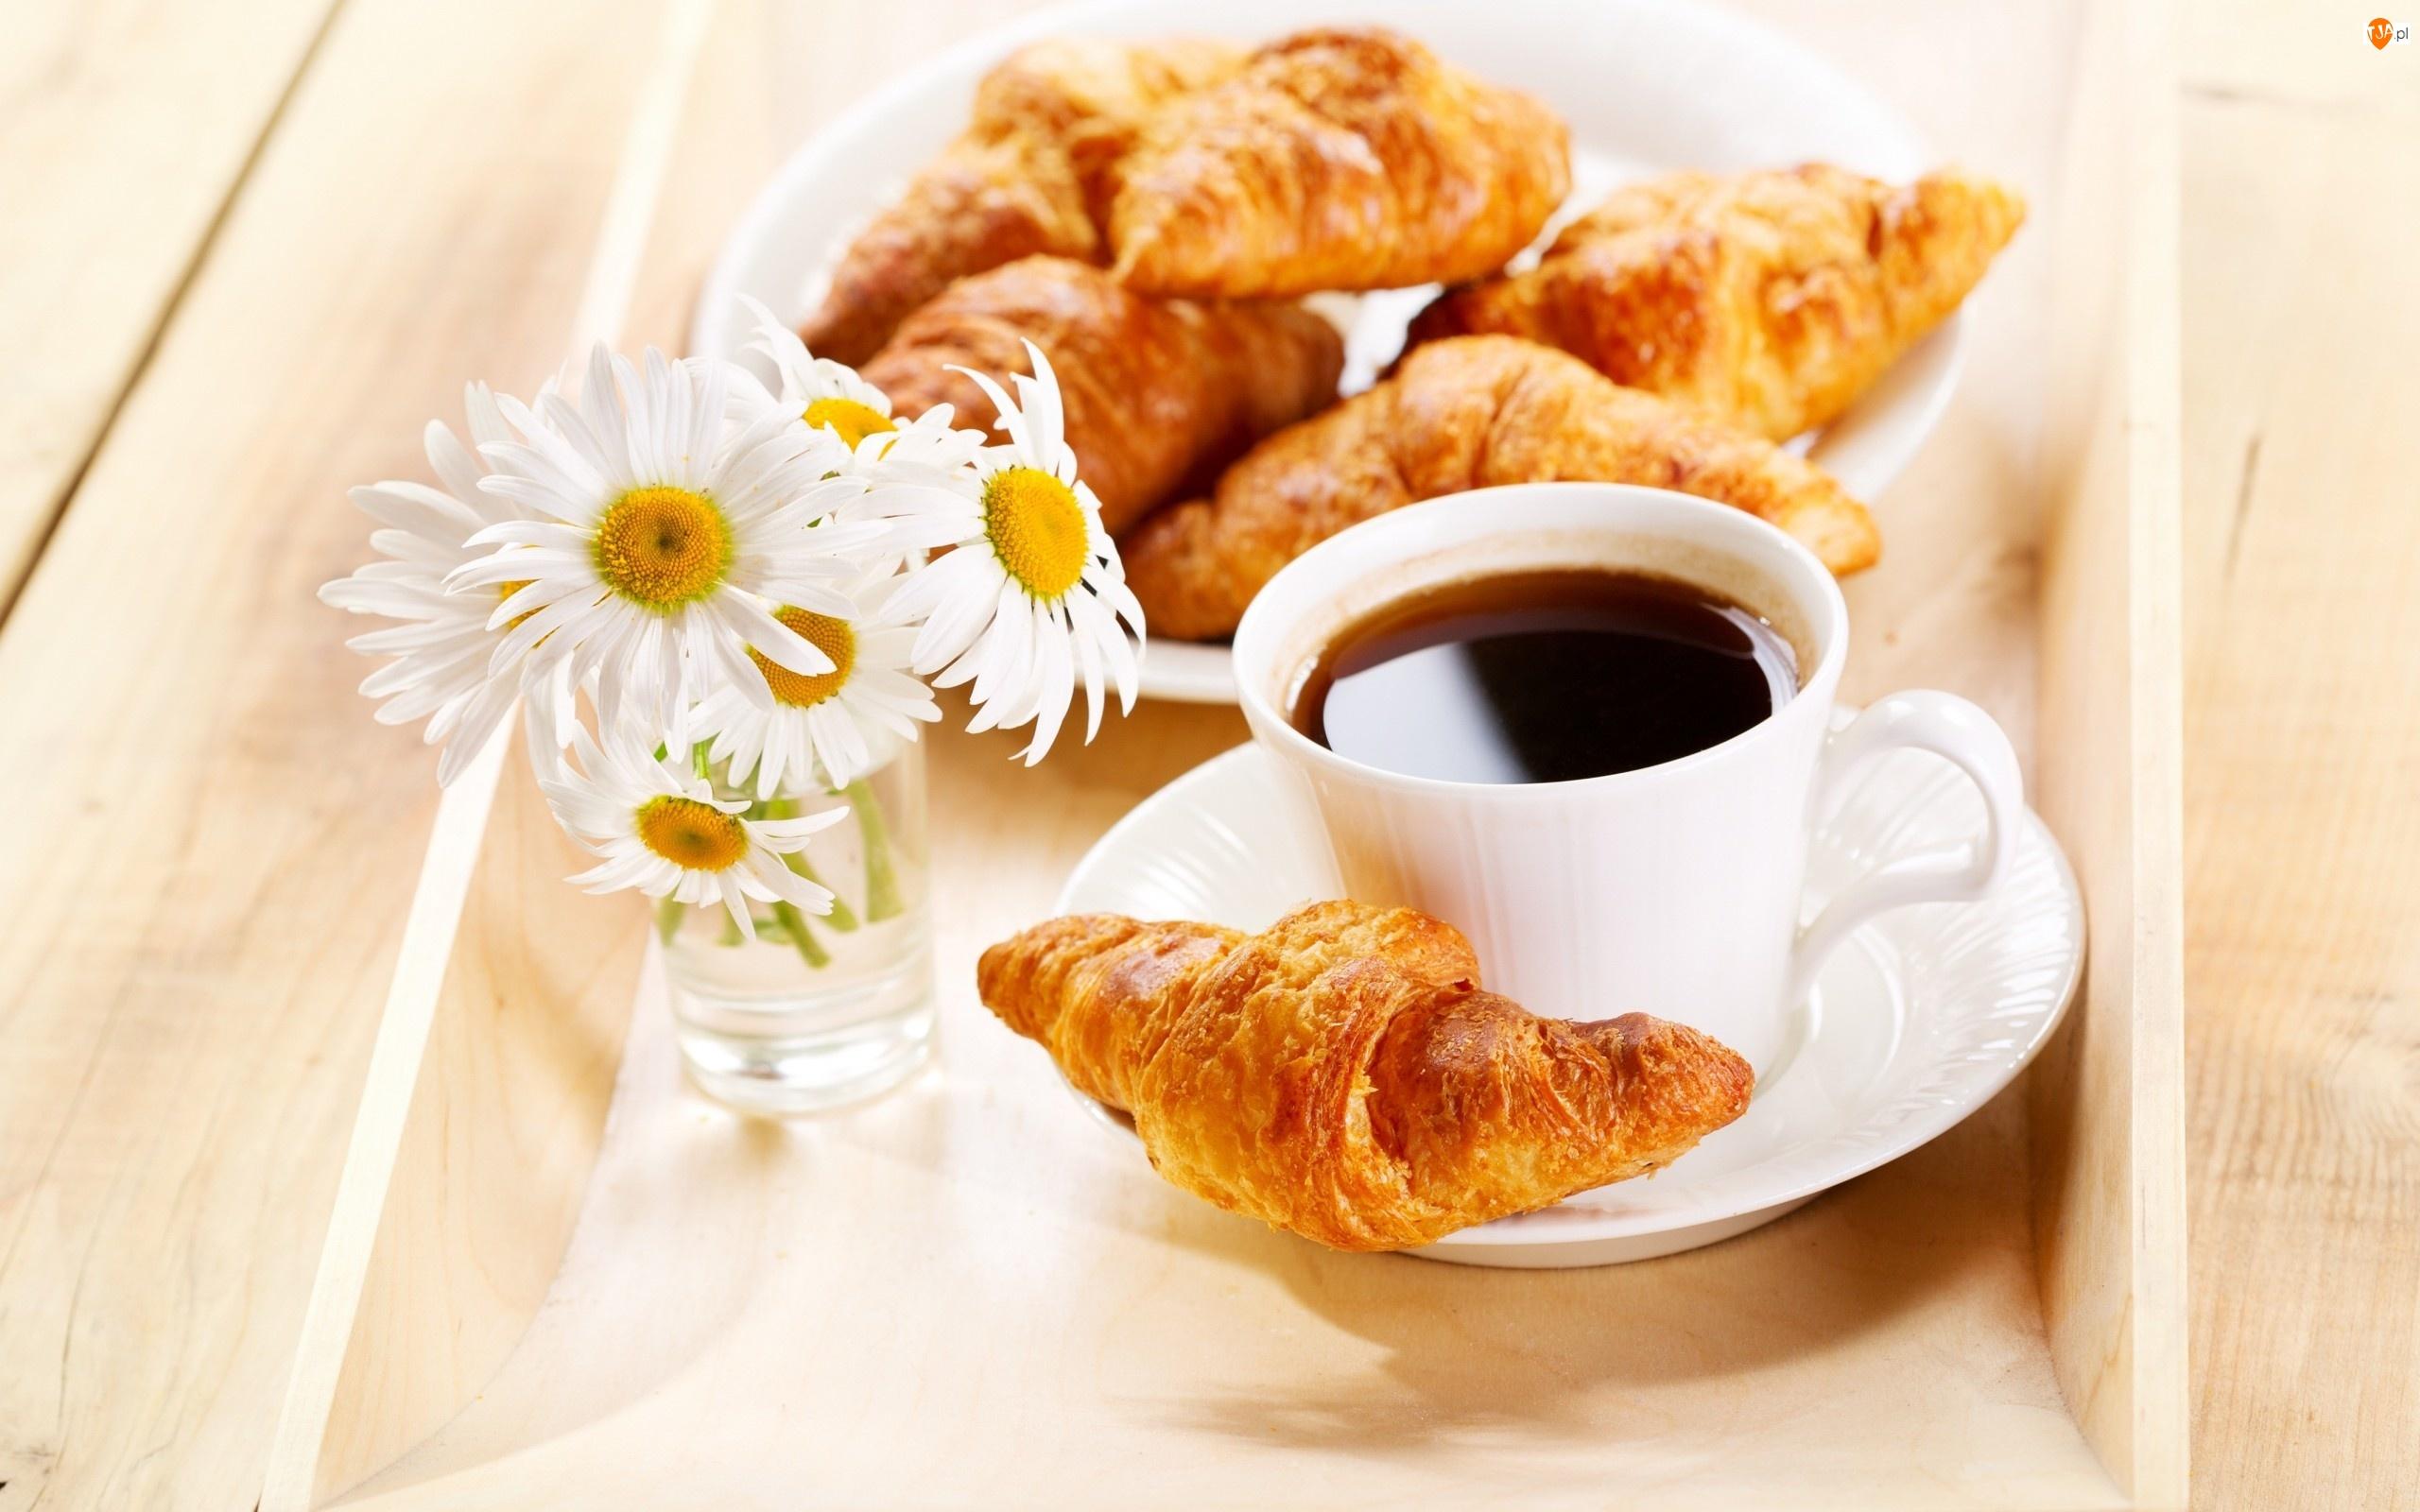 Kwiaty, Rogaliki, Kawa